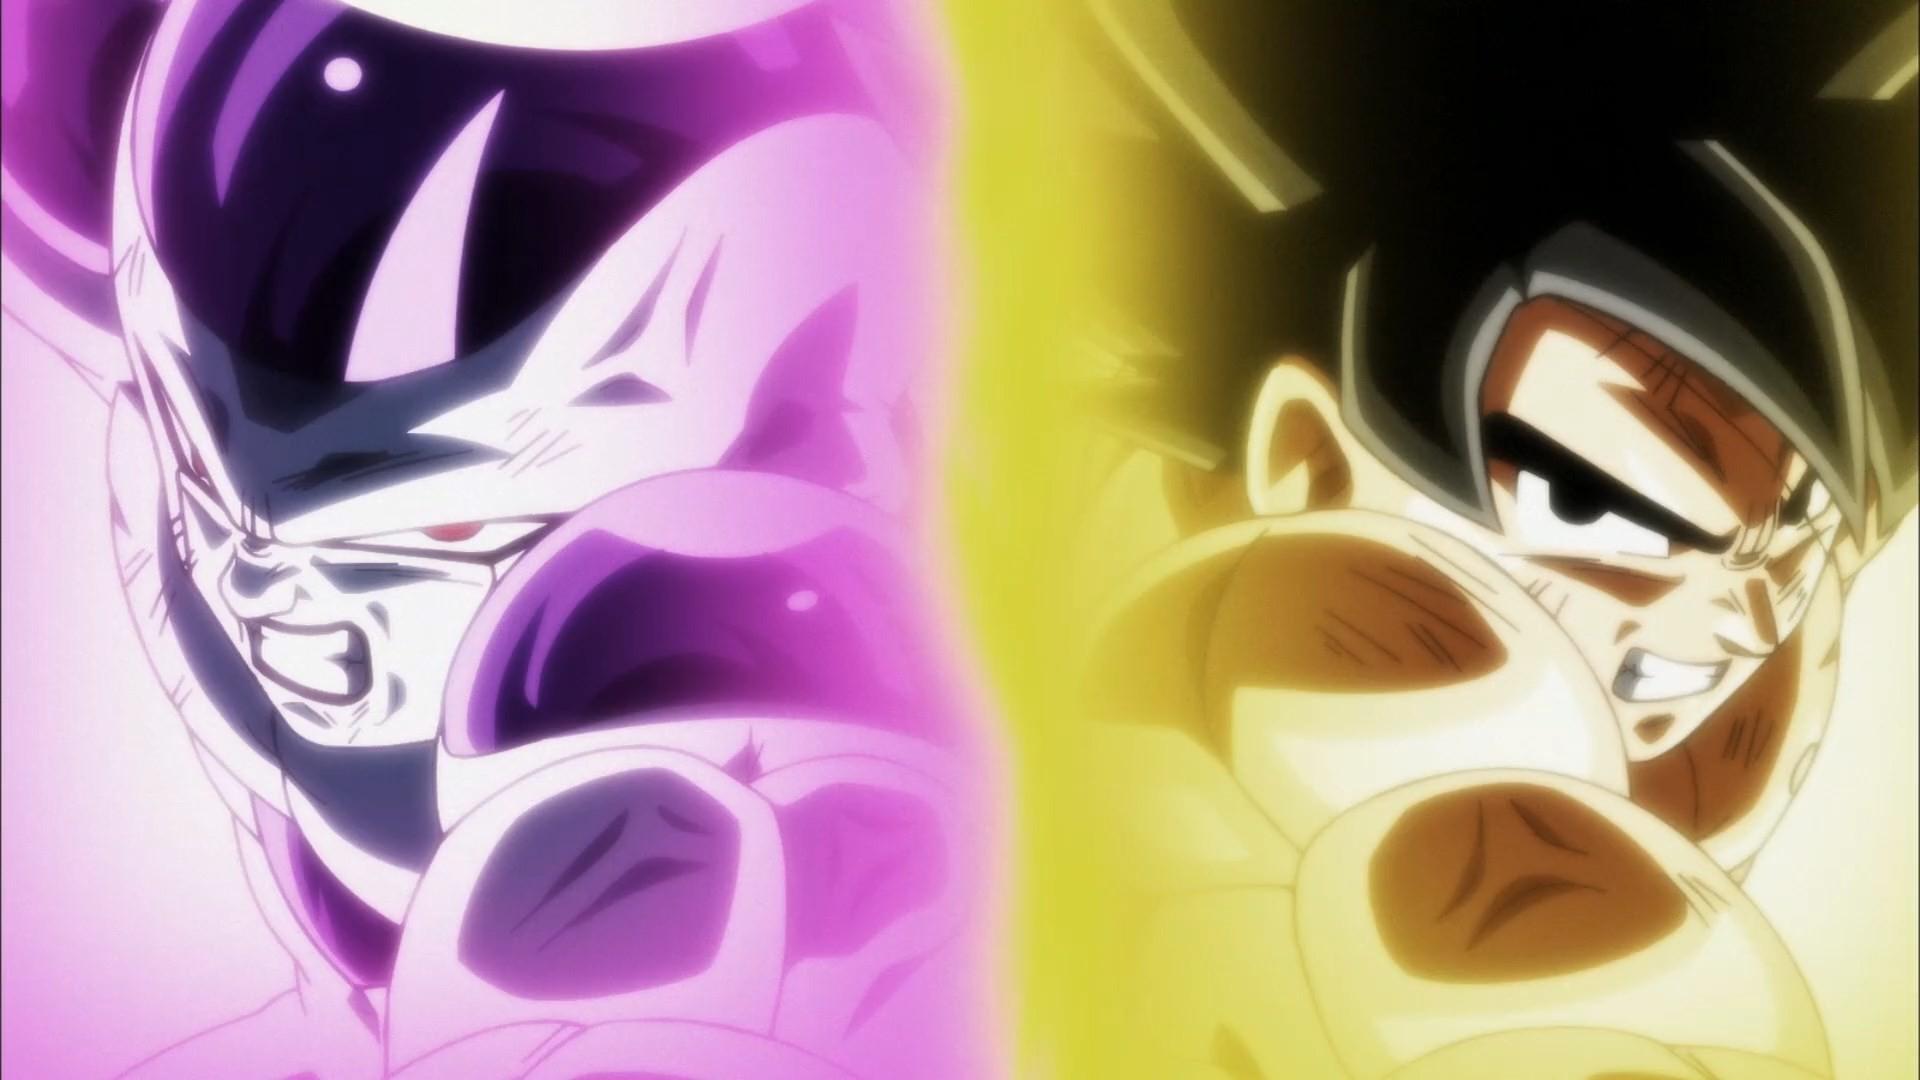 Res: 1920x1080, Wallpaper for Episode 131 - Goku/Frieza ...